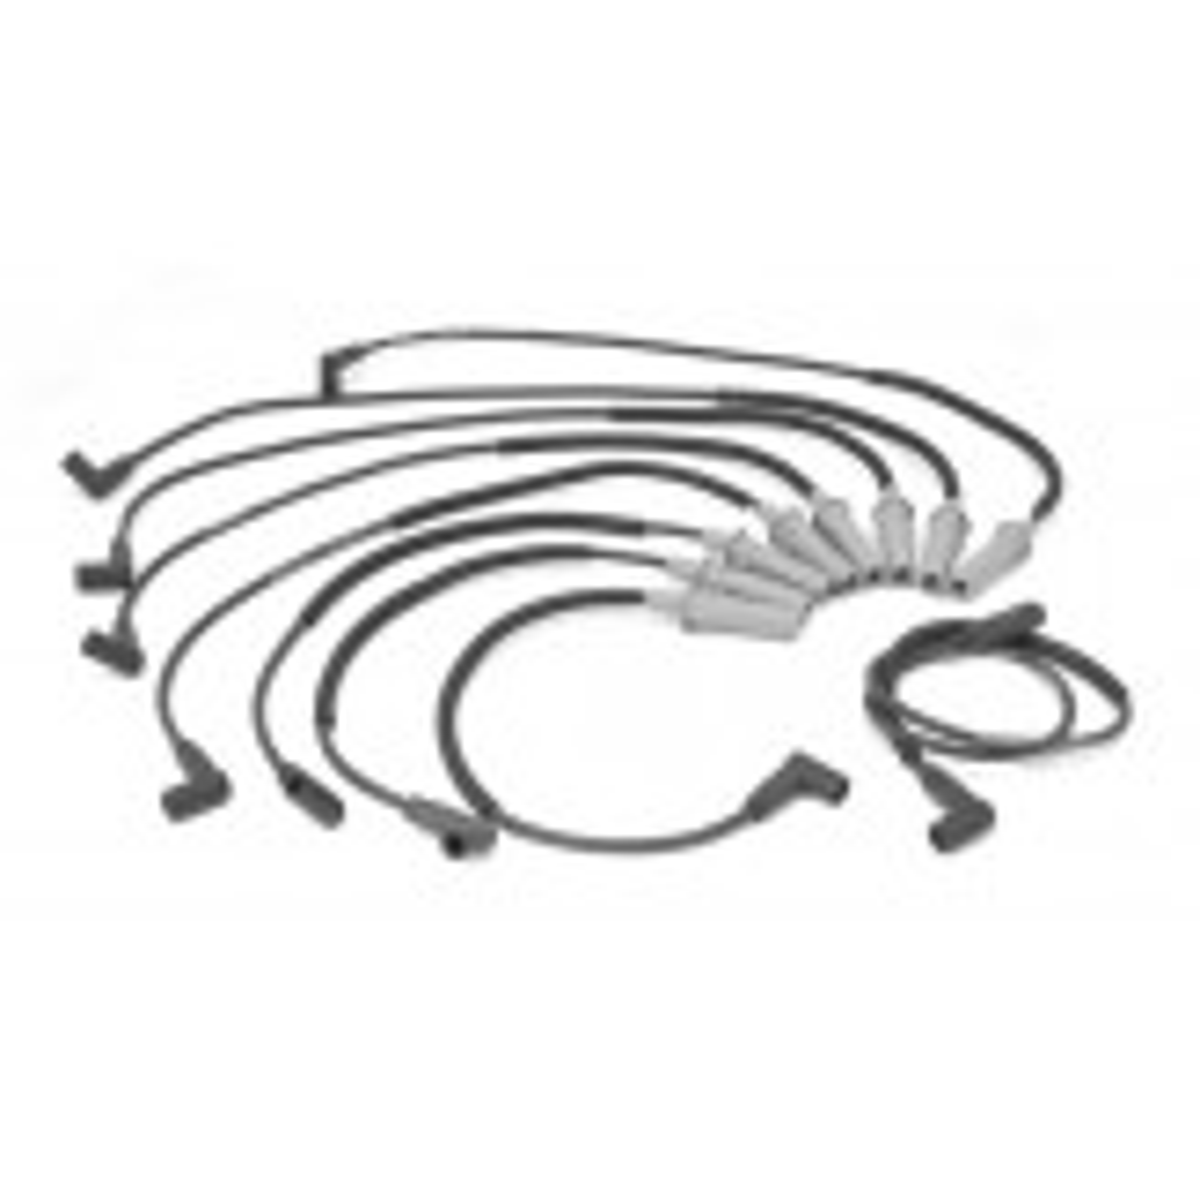 Ignition Wire Set, 5.2L/5.9L; 93-98 Jeep Grand Cherokee ZJ